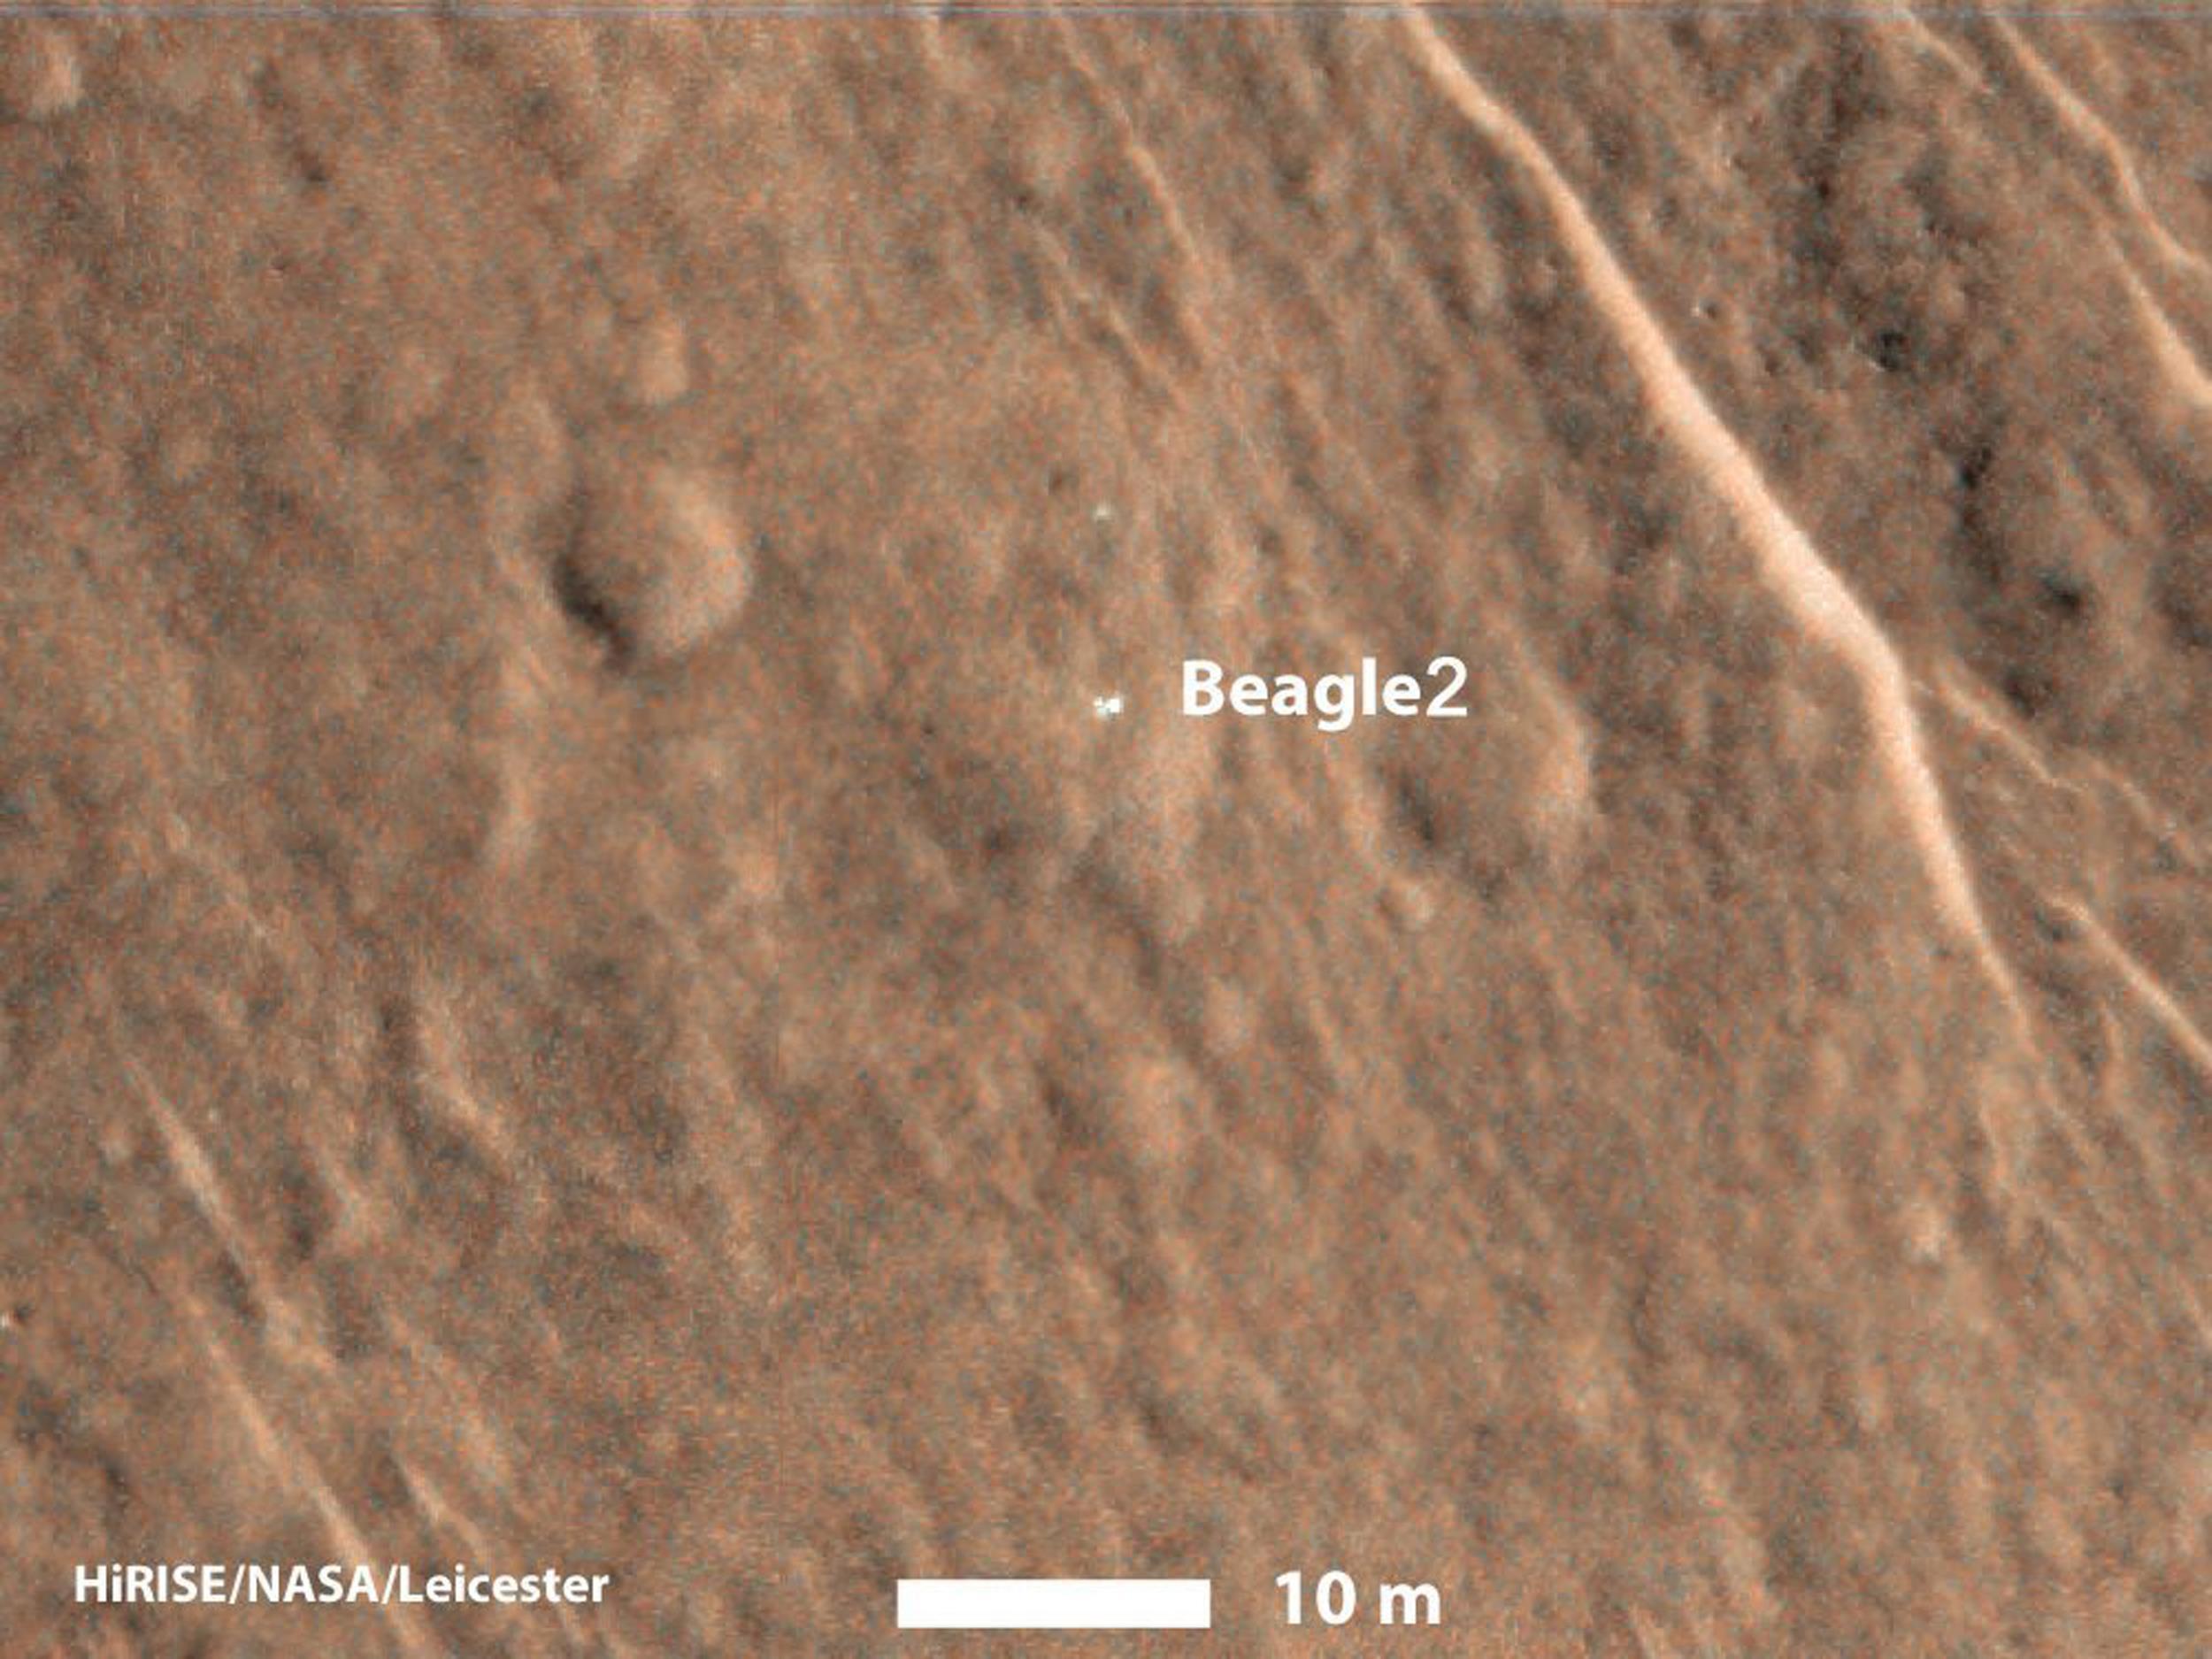 Missing Beagle 2 Mars Lander Spotted on Planet's Surface ...